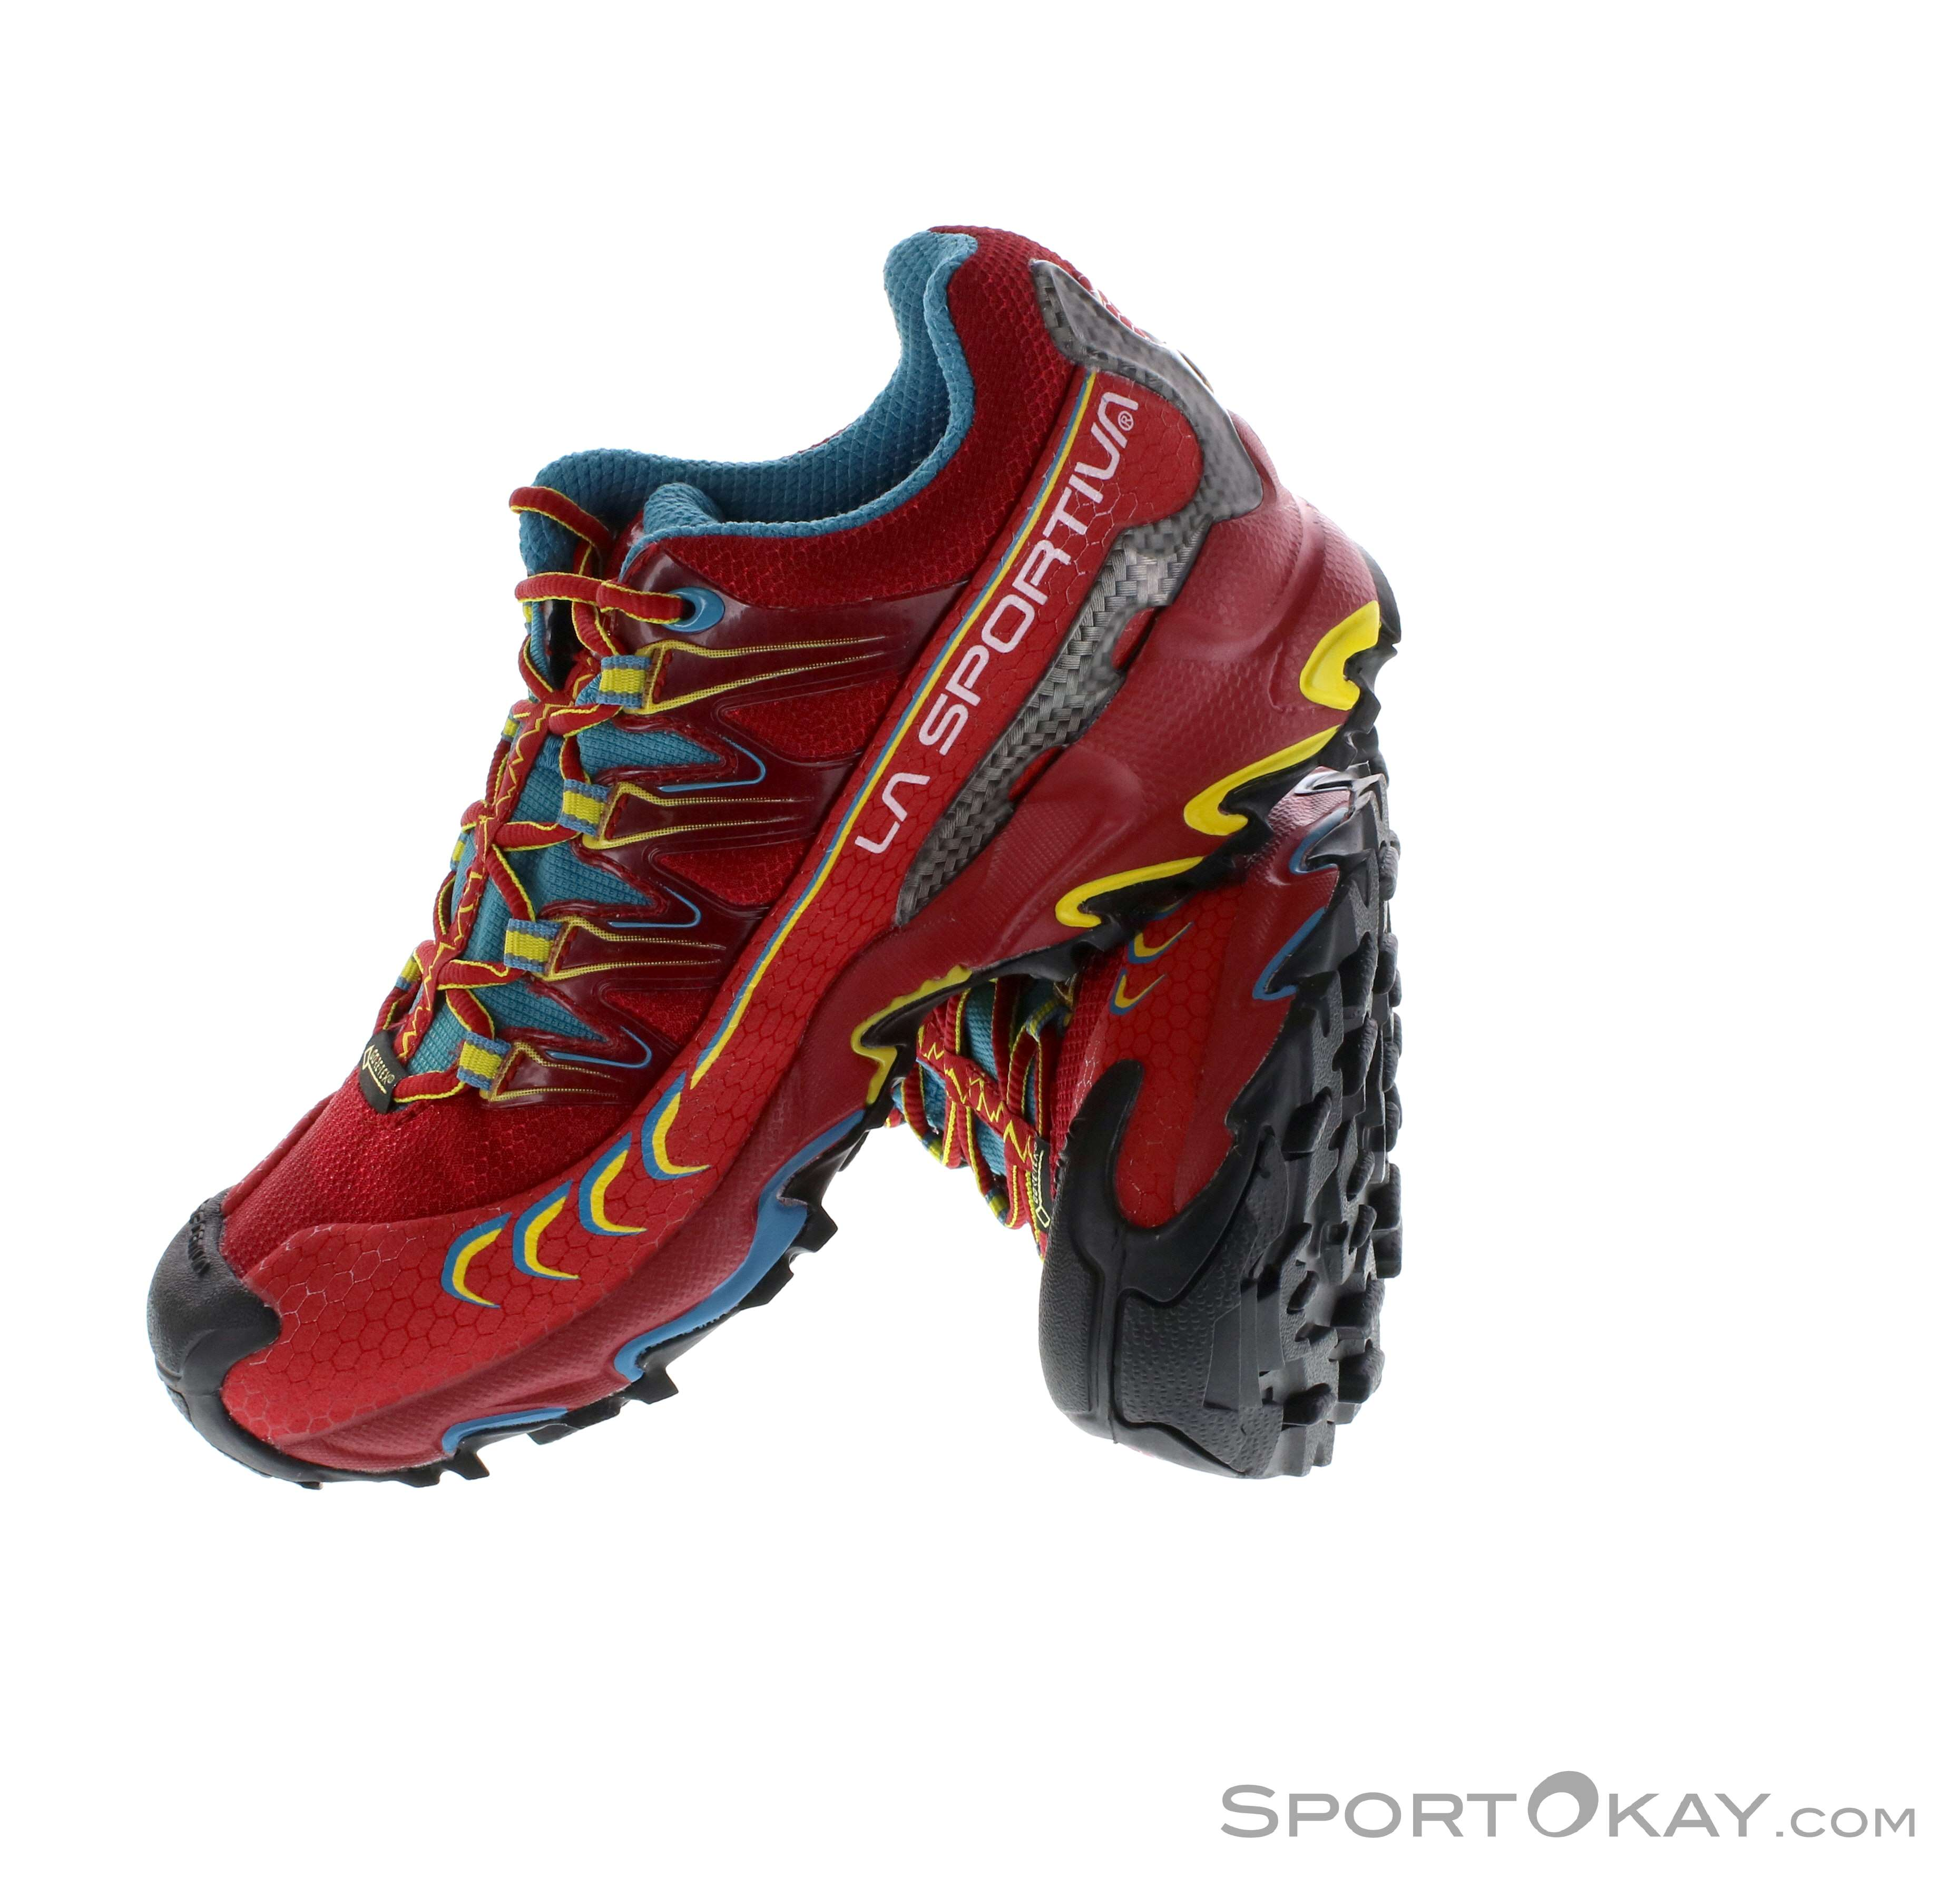 separation shoes 200fb 646d0 La Sportiva Ultra Raptor GTX Ws Trail Running Shoes Gore-Tex, La Sportiva,